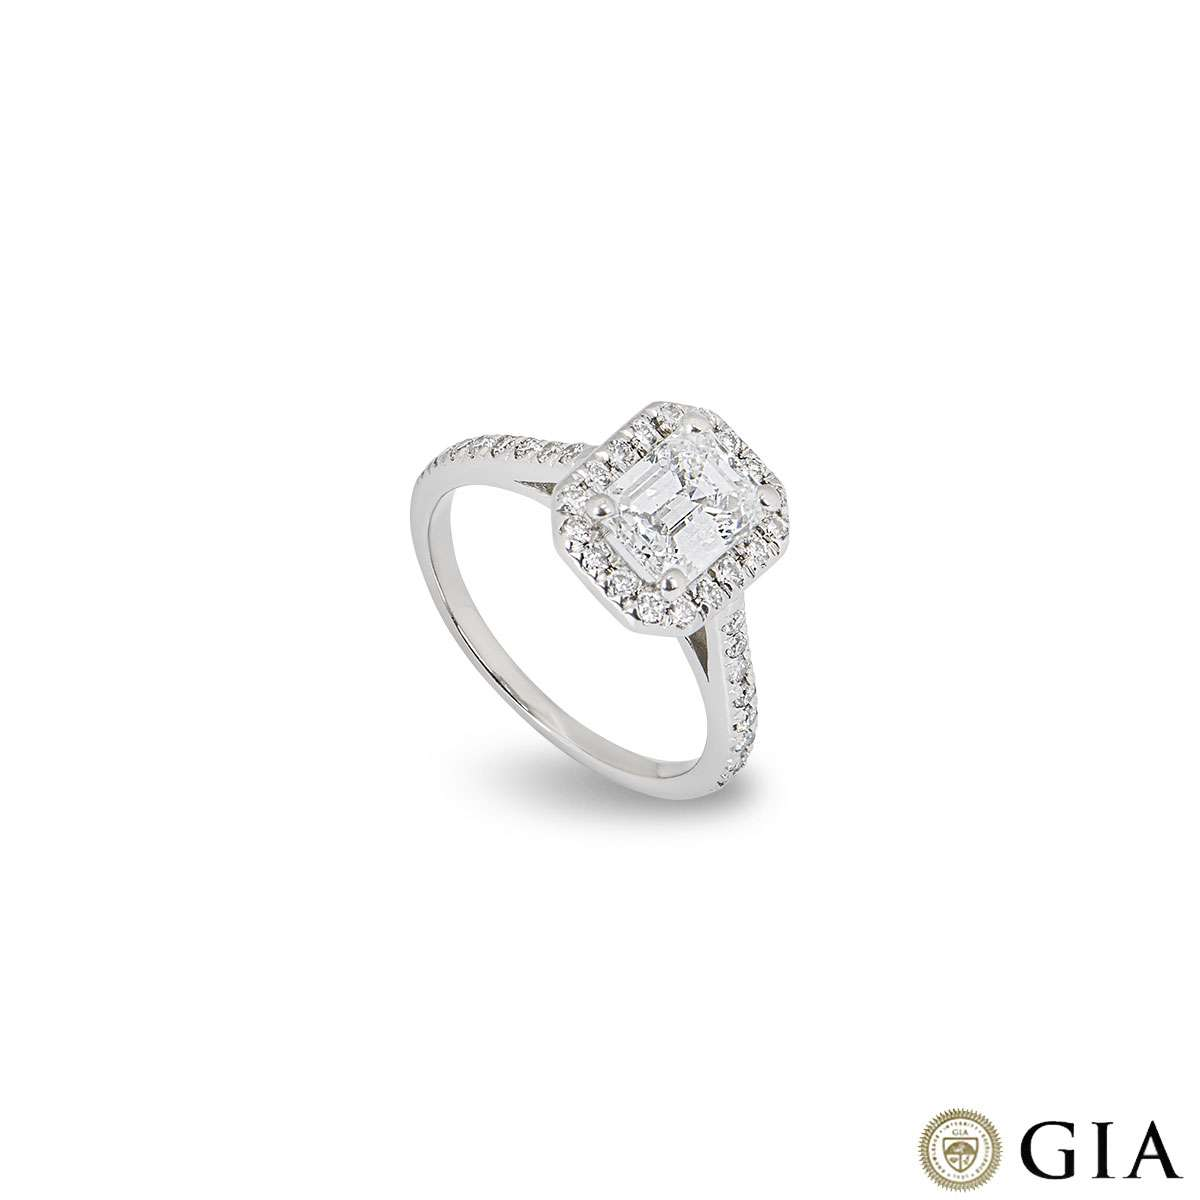 Platinum Emerald Cut Diamond Ring 1.21ct D/VVS2